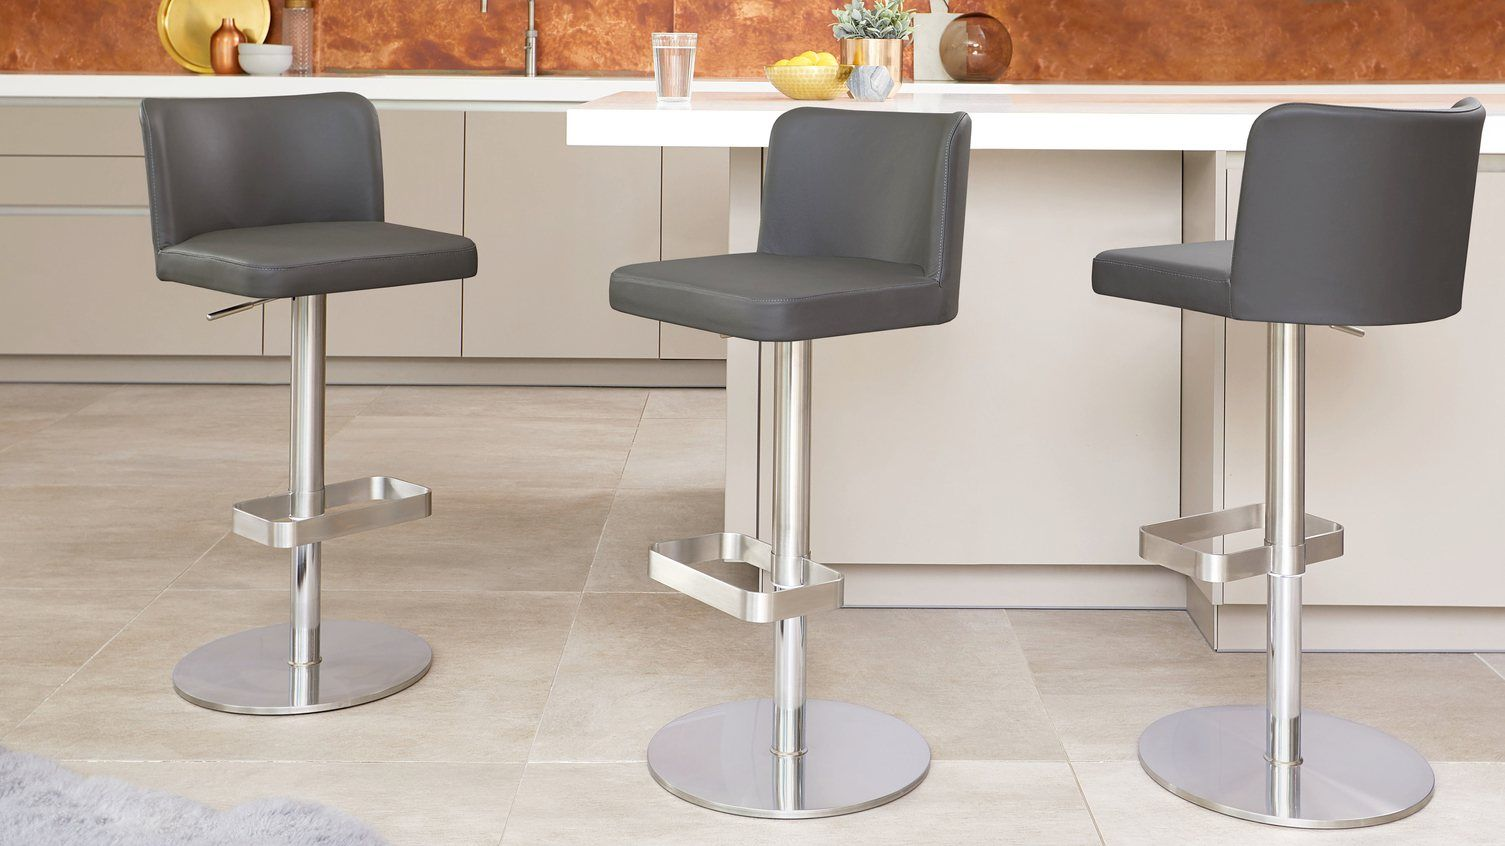 Dark Grey Gas Lift Leather Bar Stools Designer Bar Stools Modern Kitchen Stools Bar Stools